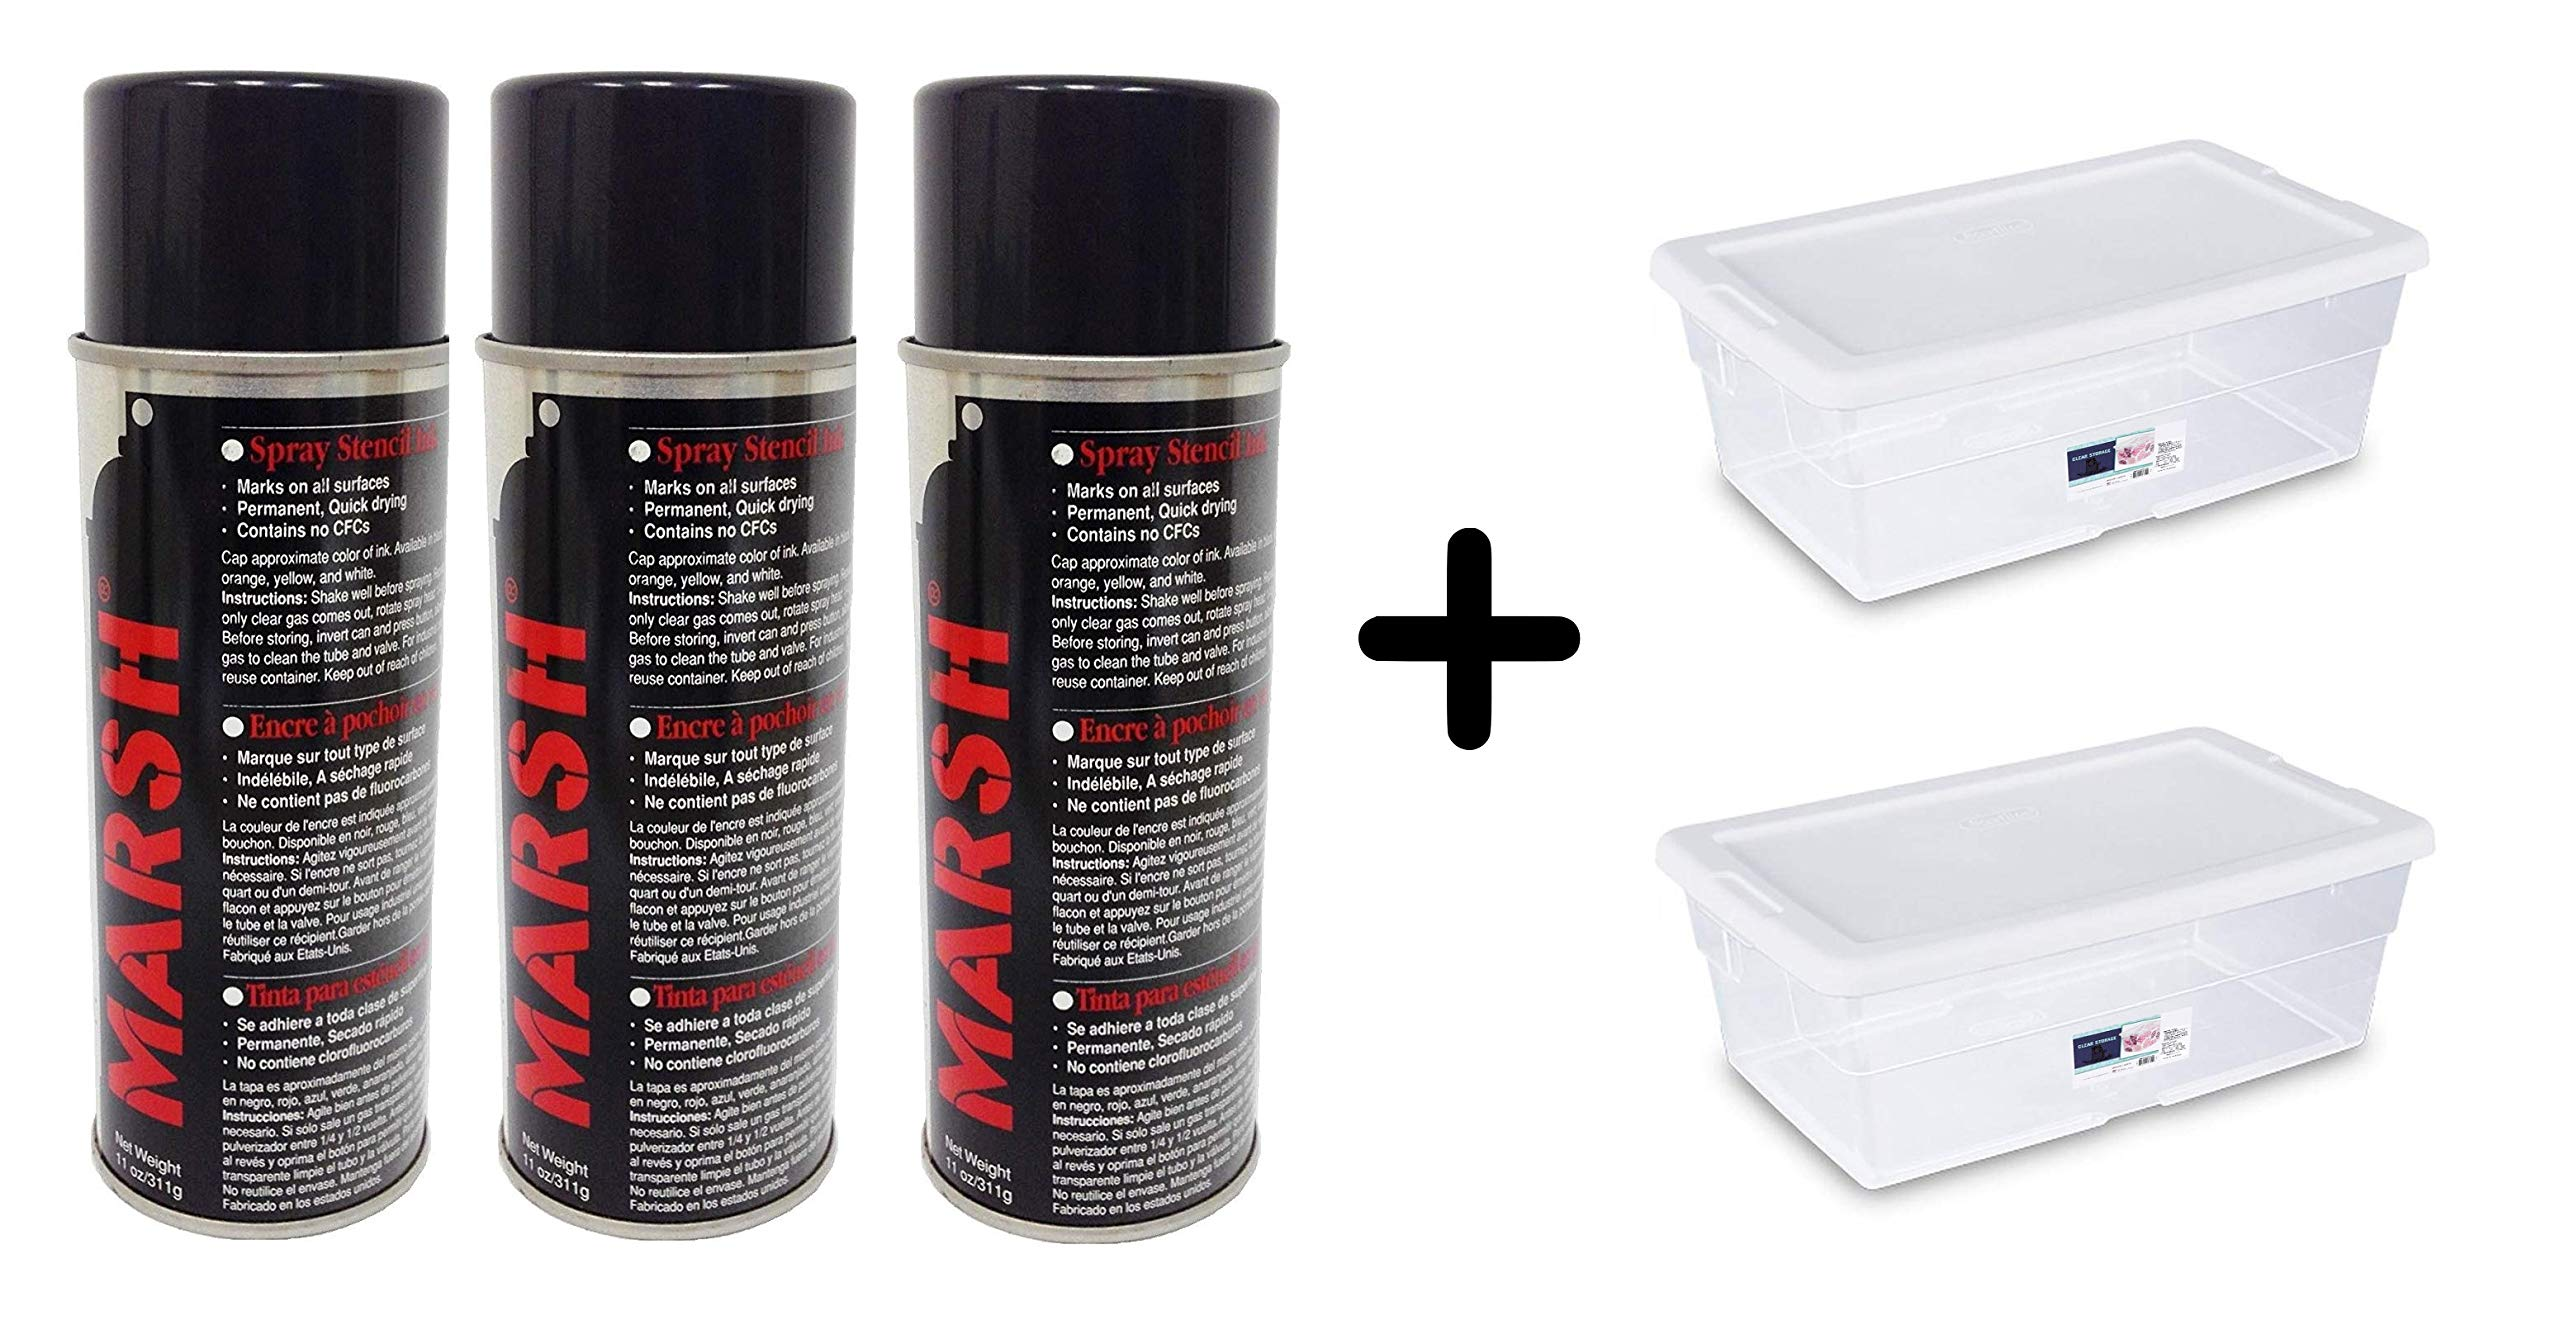 MARSH Stencil Ink, 14 fl oz Spray Can, Black (Net weight 11 fl oz) (3-SET) by Marsh